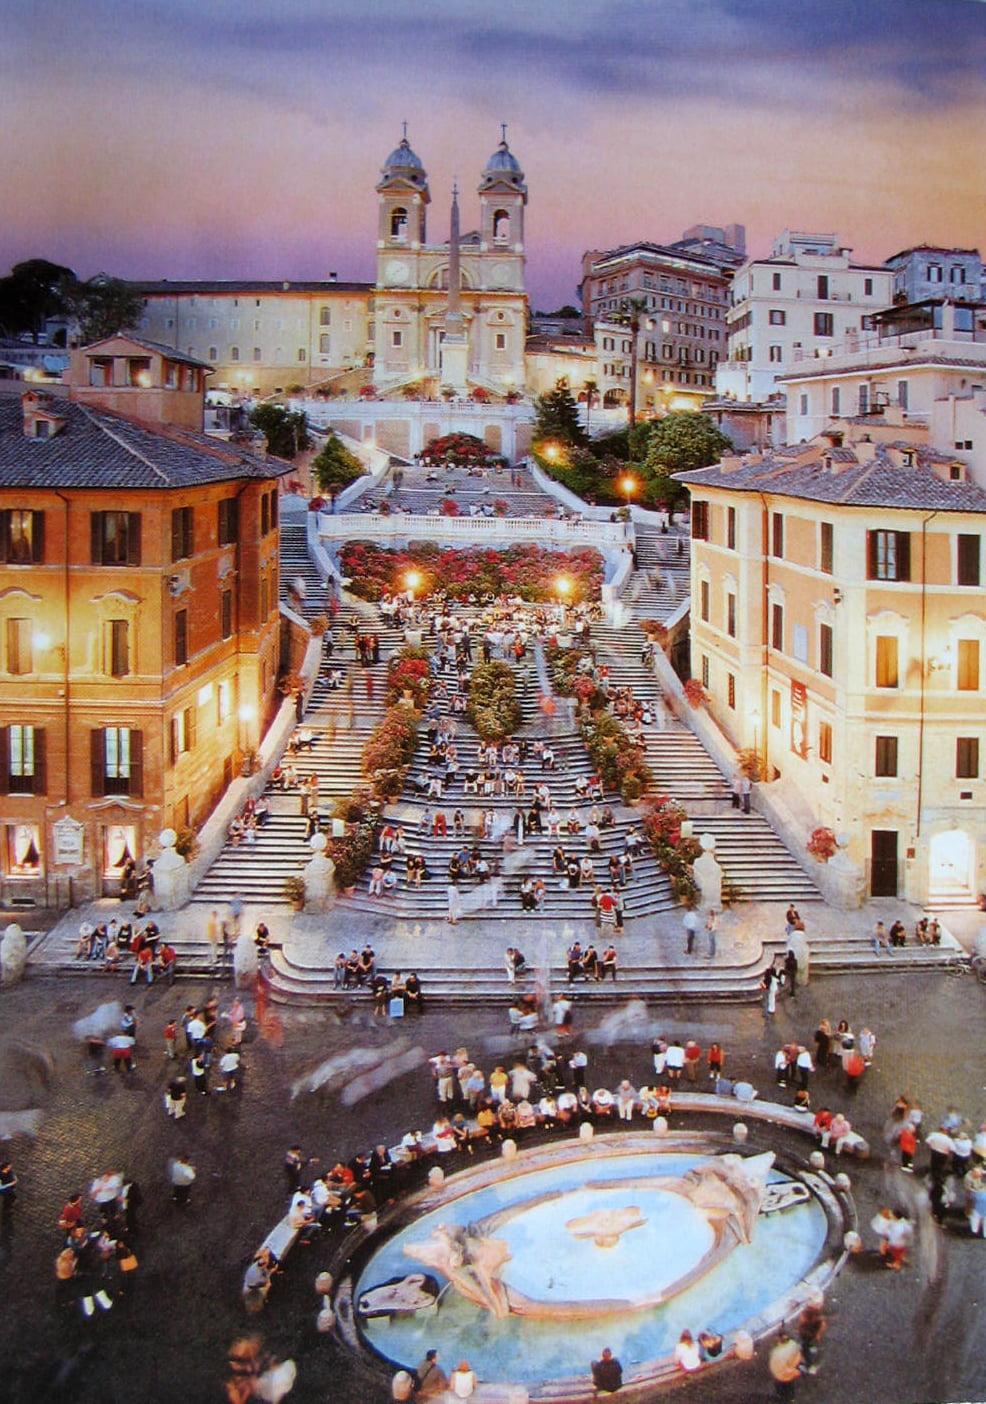 GRUP ORGANIZAT ROMA-TIVOLI – 5 ZILE-IULIE 2020